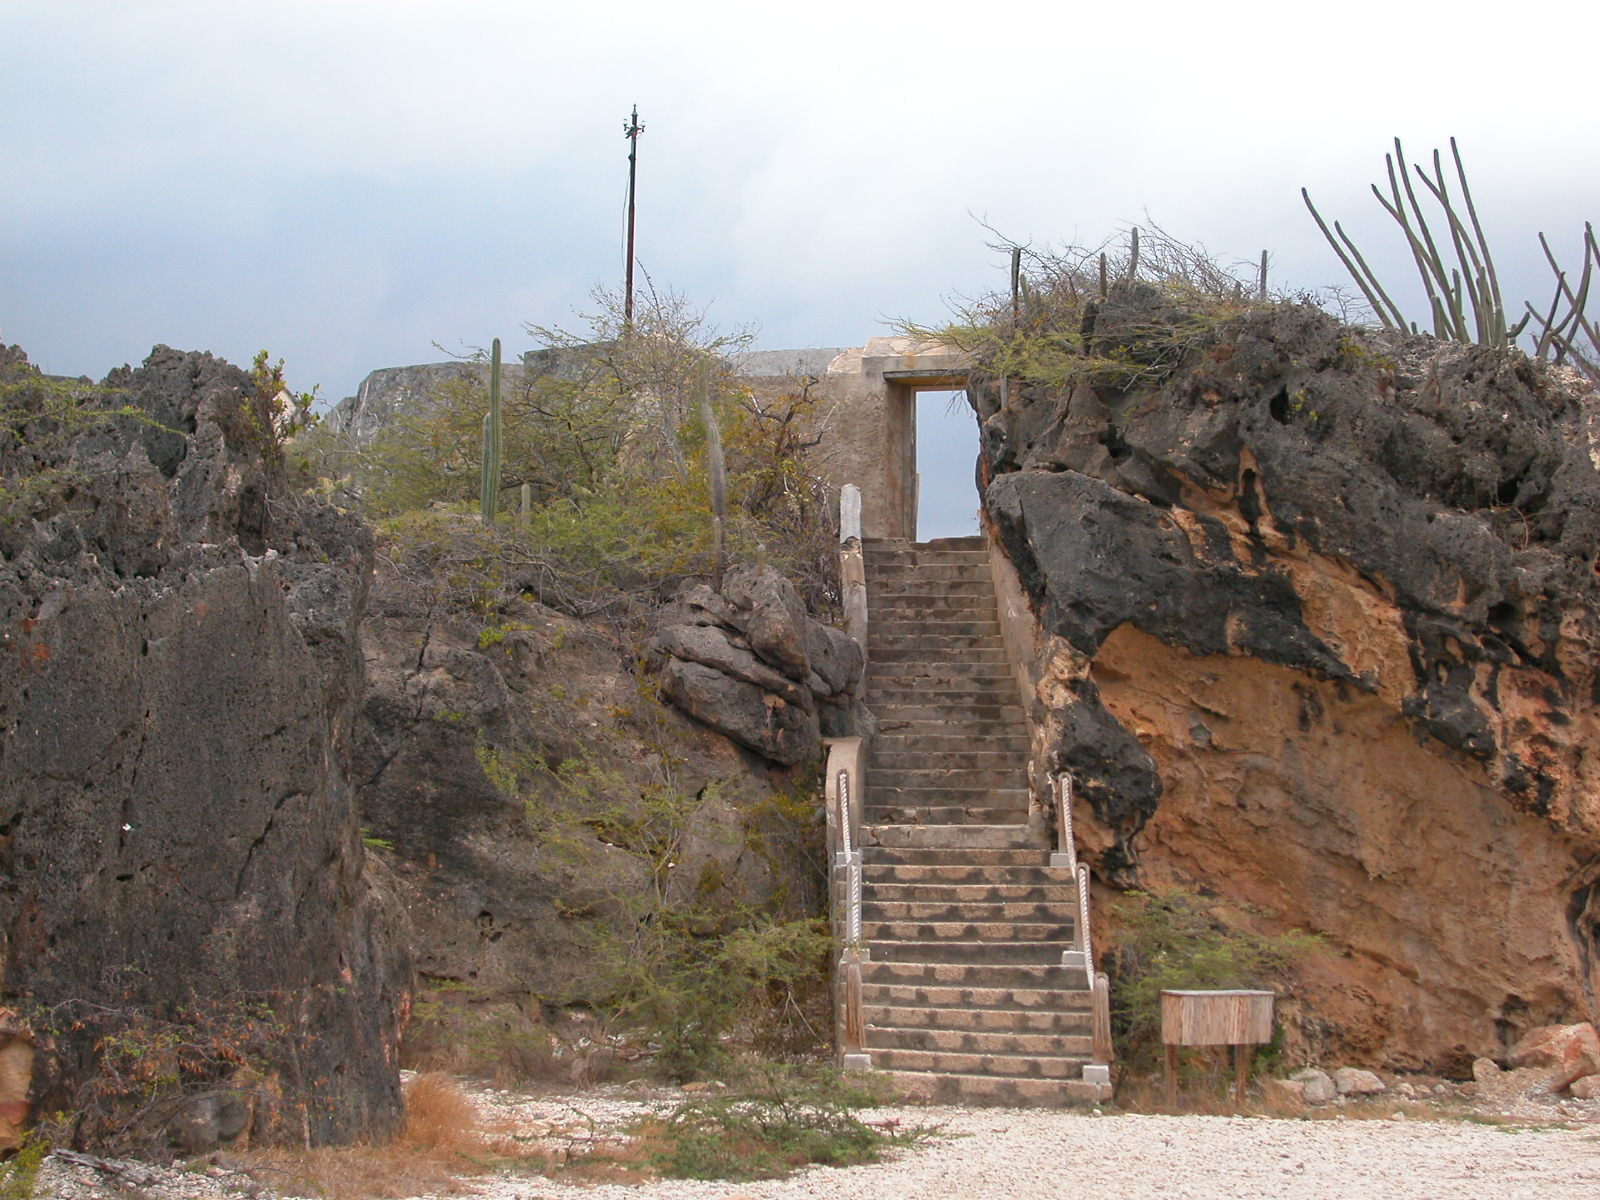 jacco steps stair stairs rocks rocky warm tropical cacti